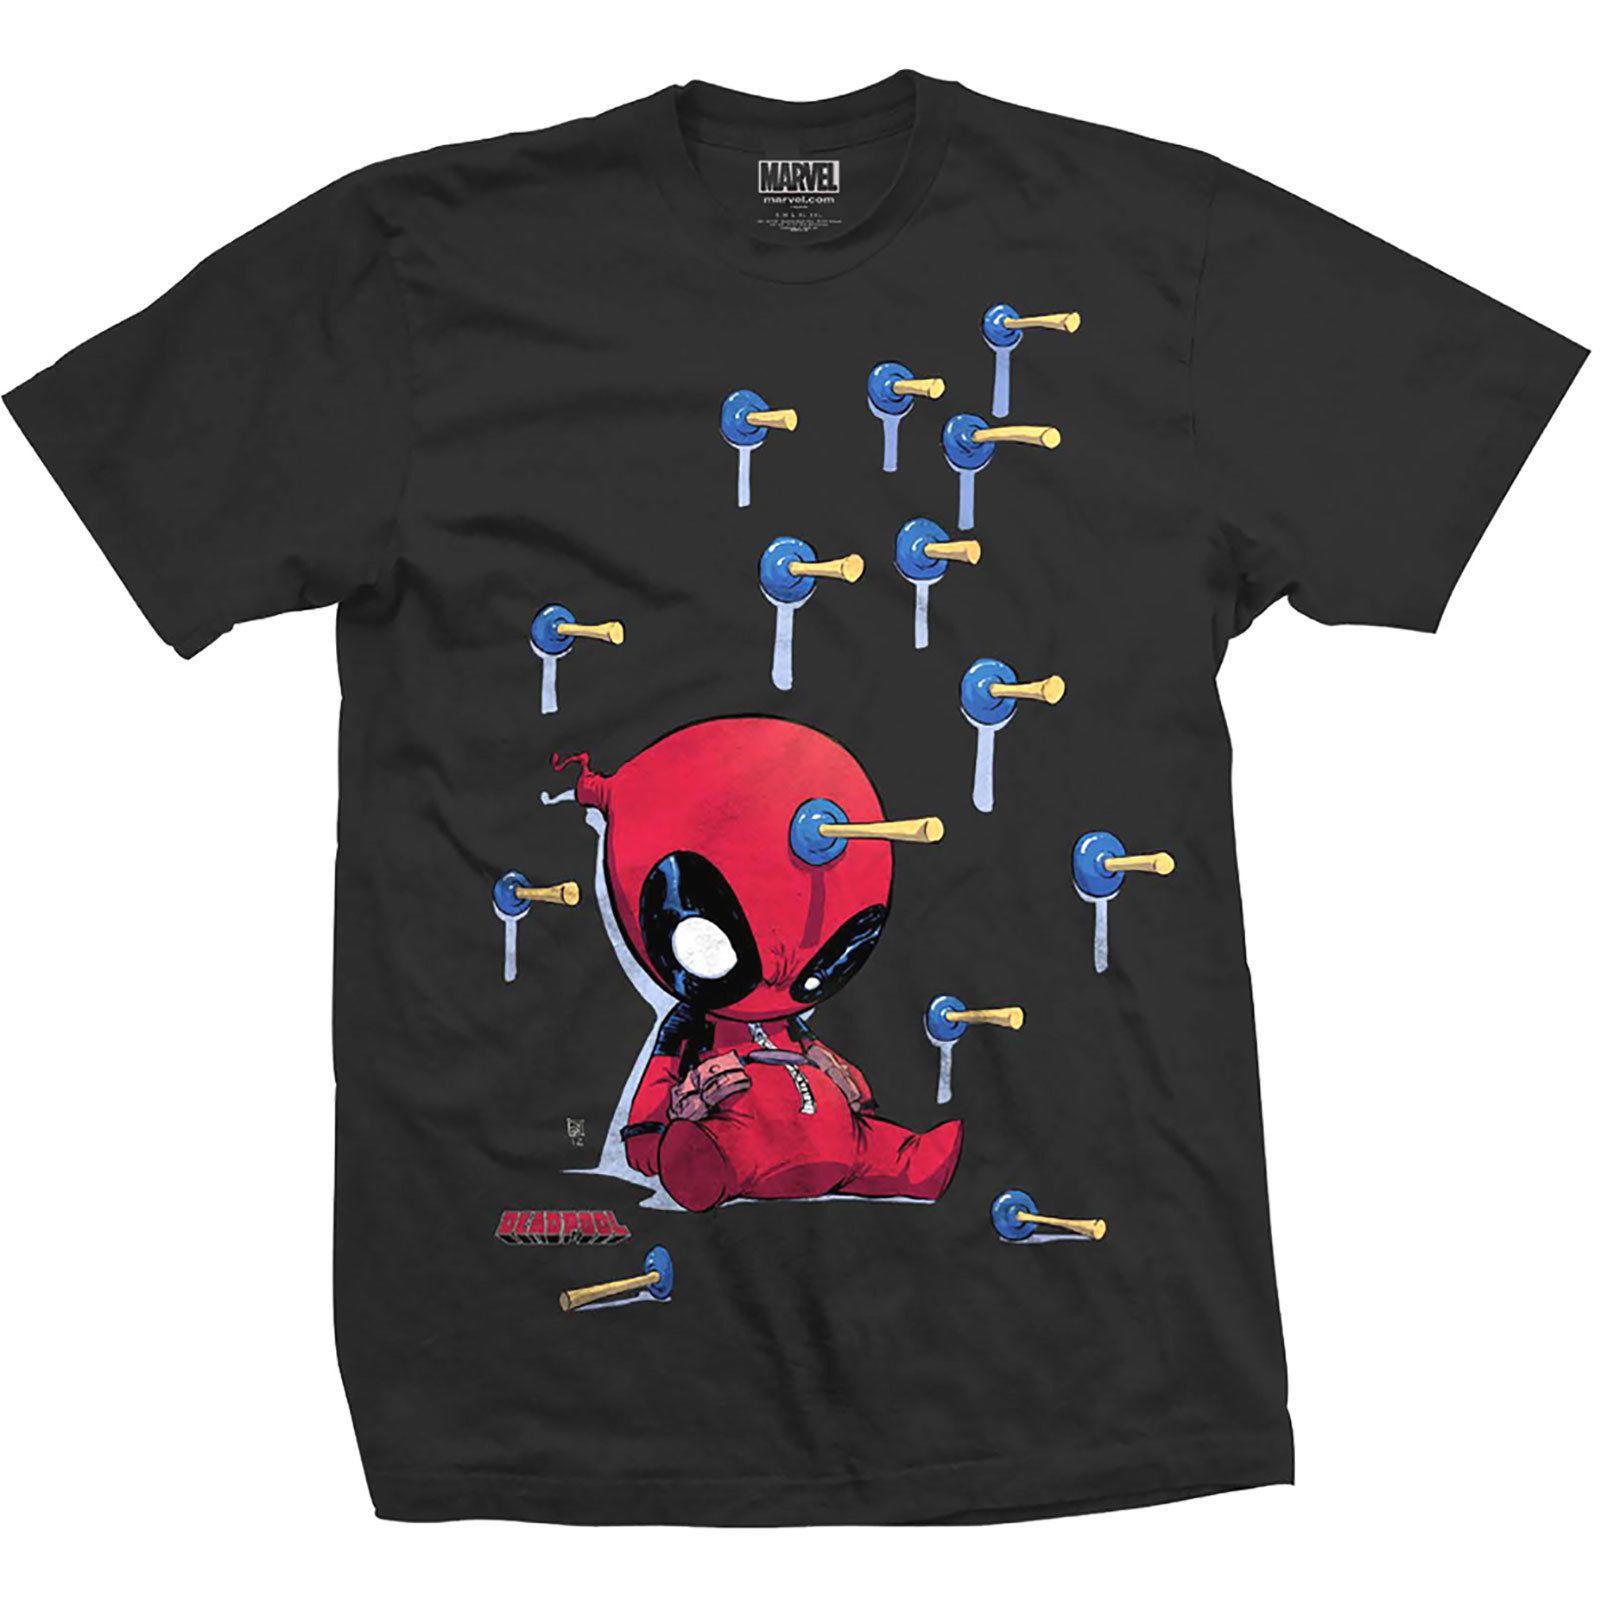 33abd47d9 Compre Deadpool Sauger Offizielle Top Camiseta De Manga Curta Kurzarm T  Shirt Da Marvel Comics Film Fil De Tisveet